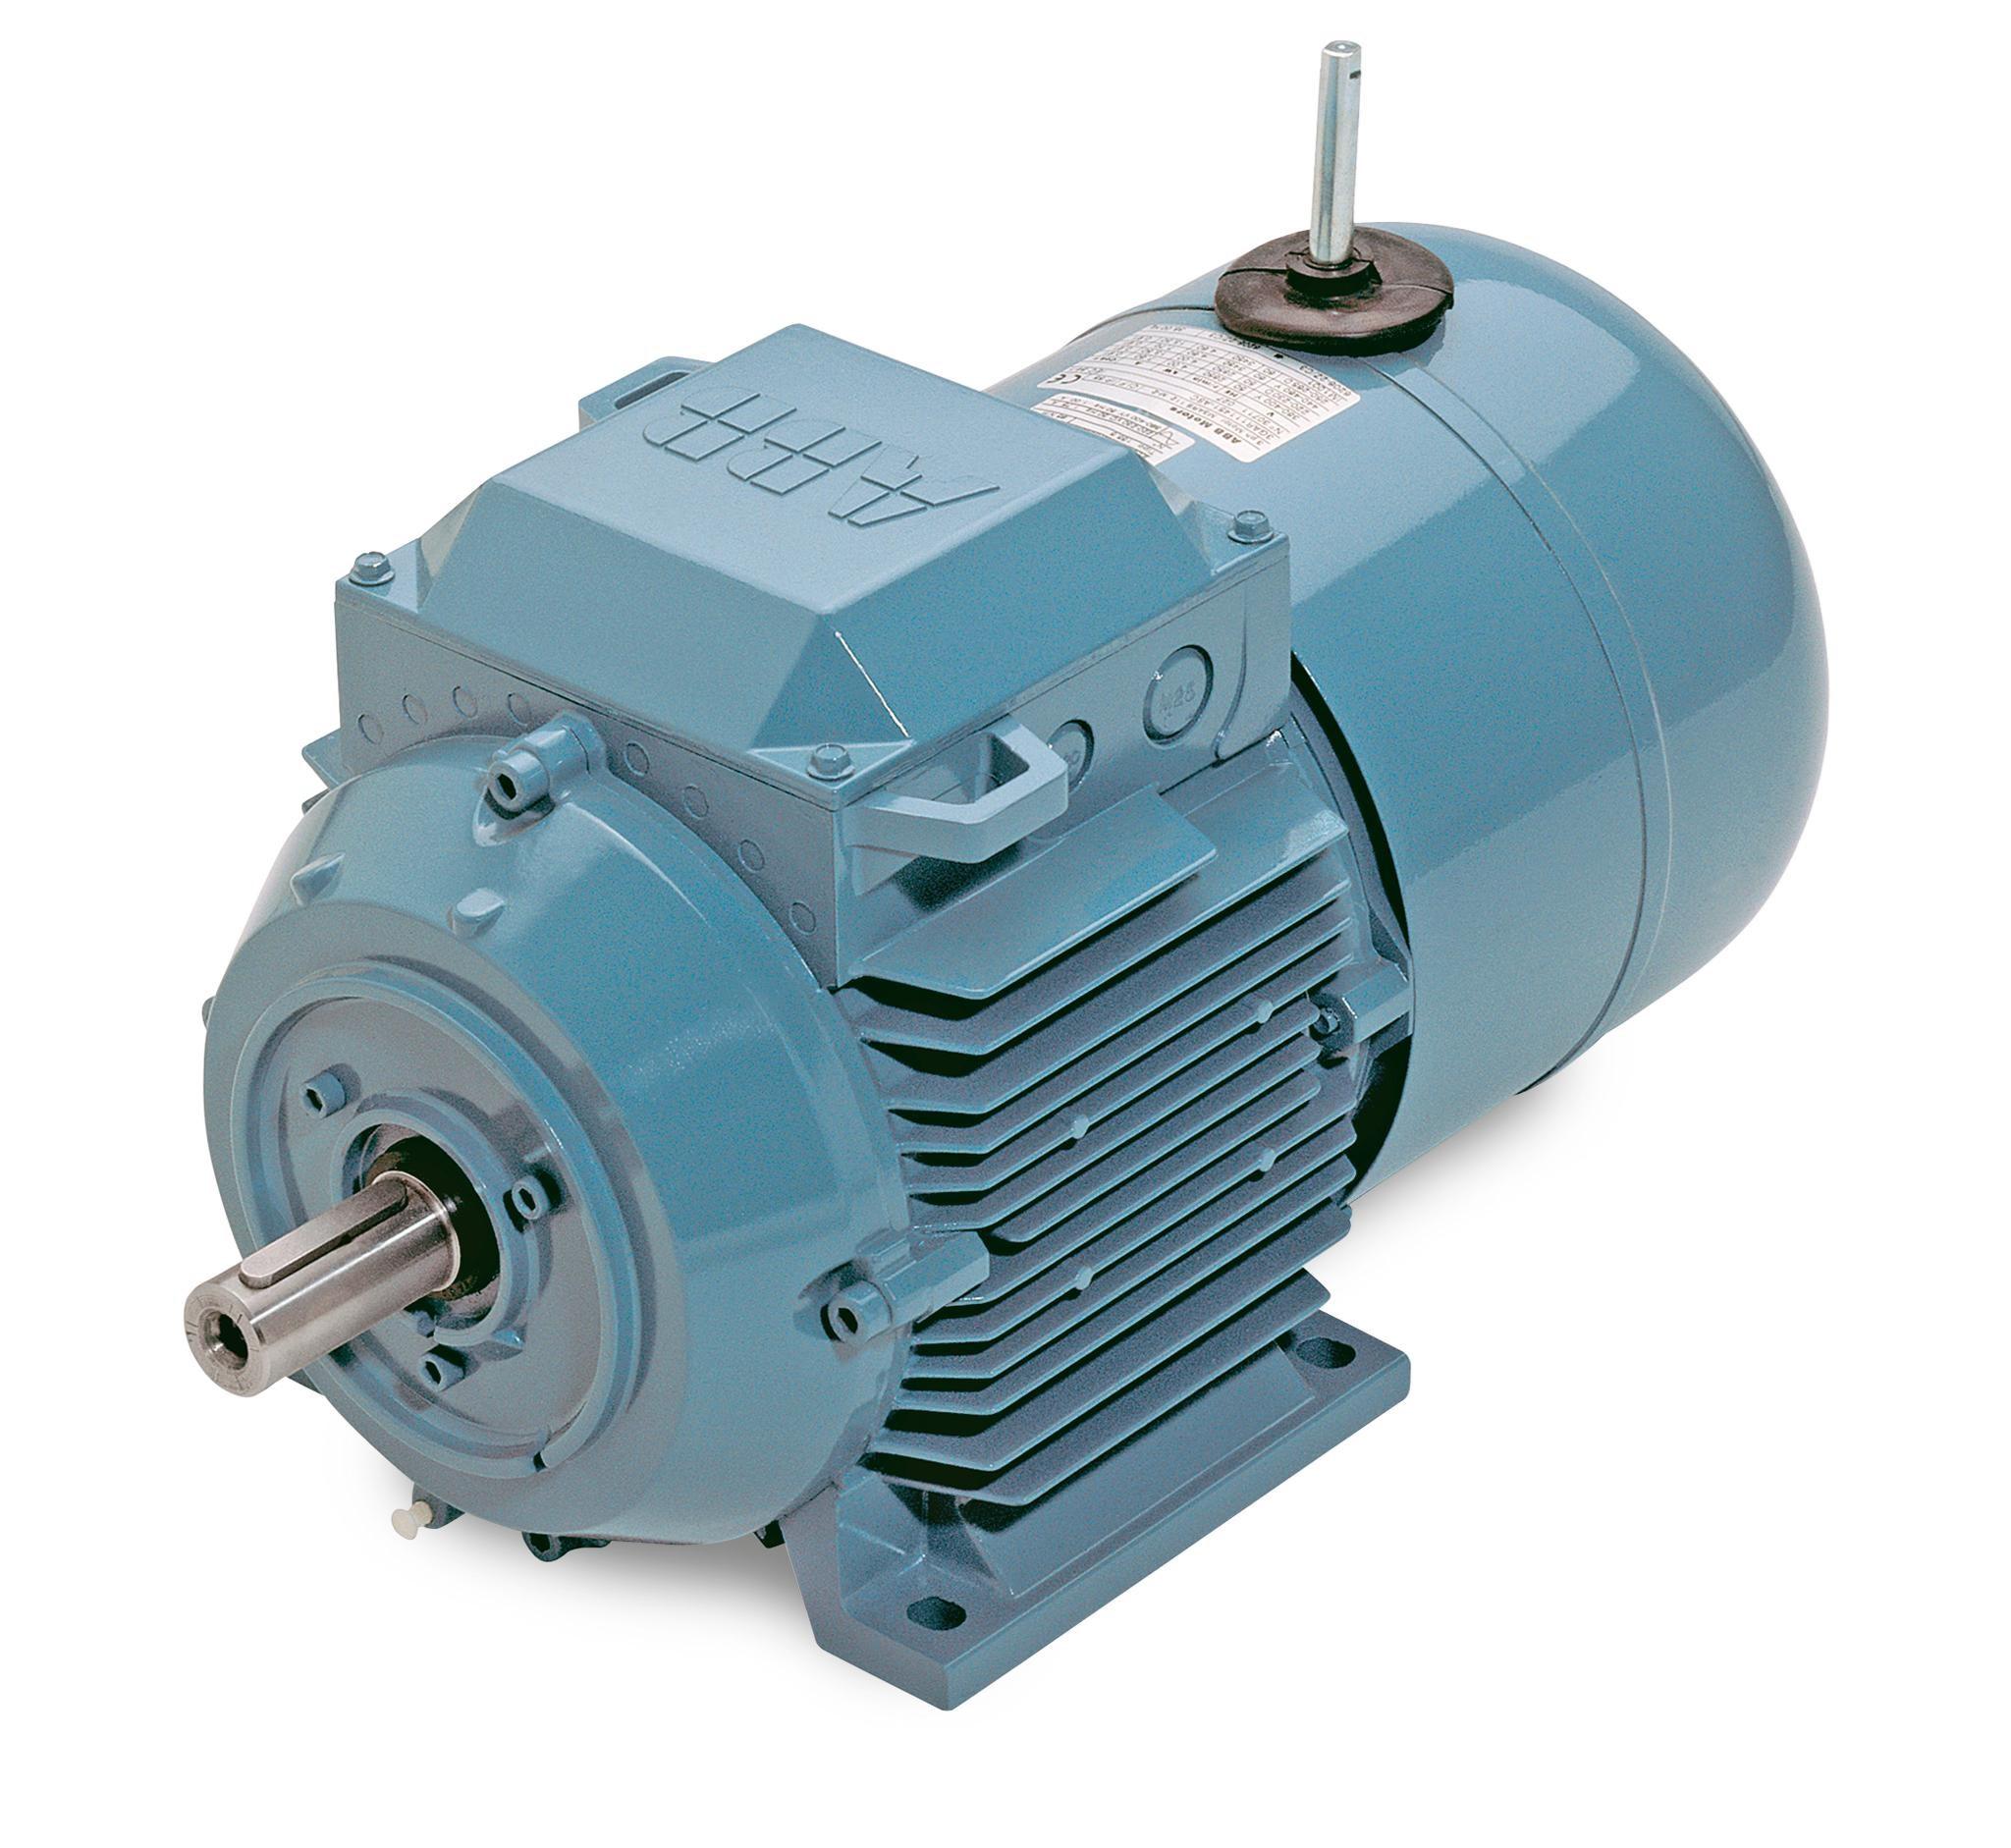 Baldor Brake Motor Wiring Diagrams Iec - Product Wiring Diagrams •